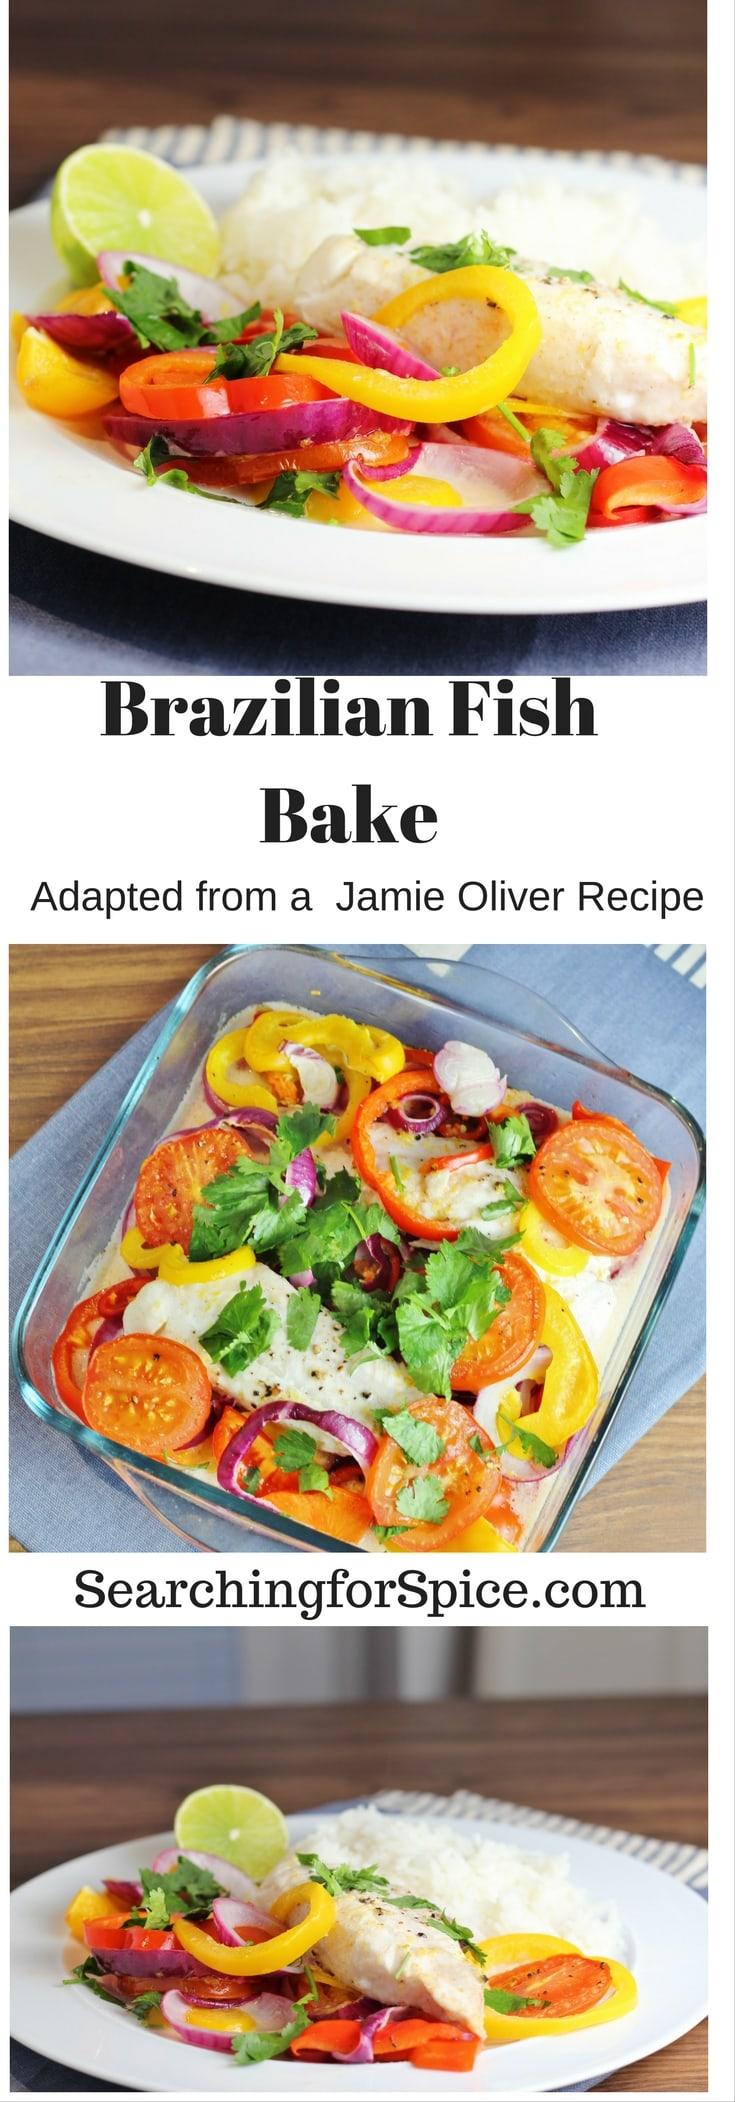 Brazilian Fish Bake - A Jamie Oliver Recipe